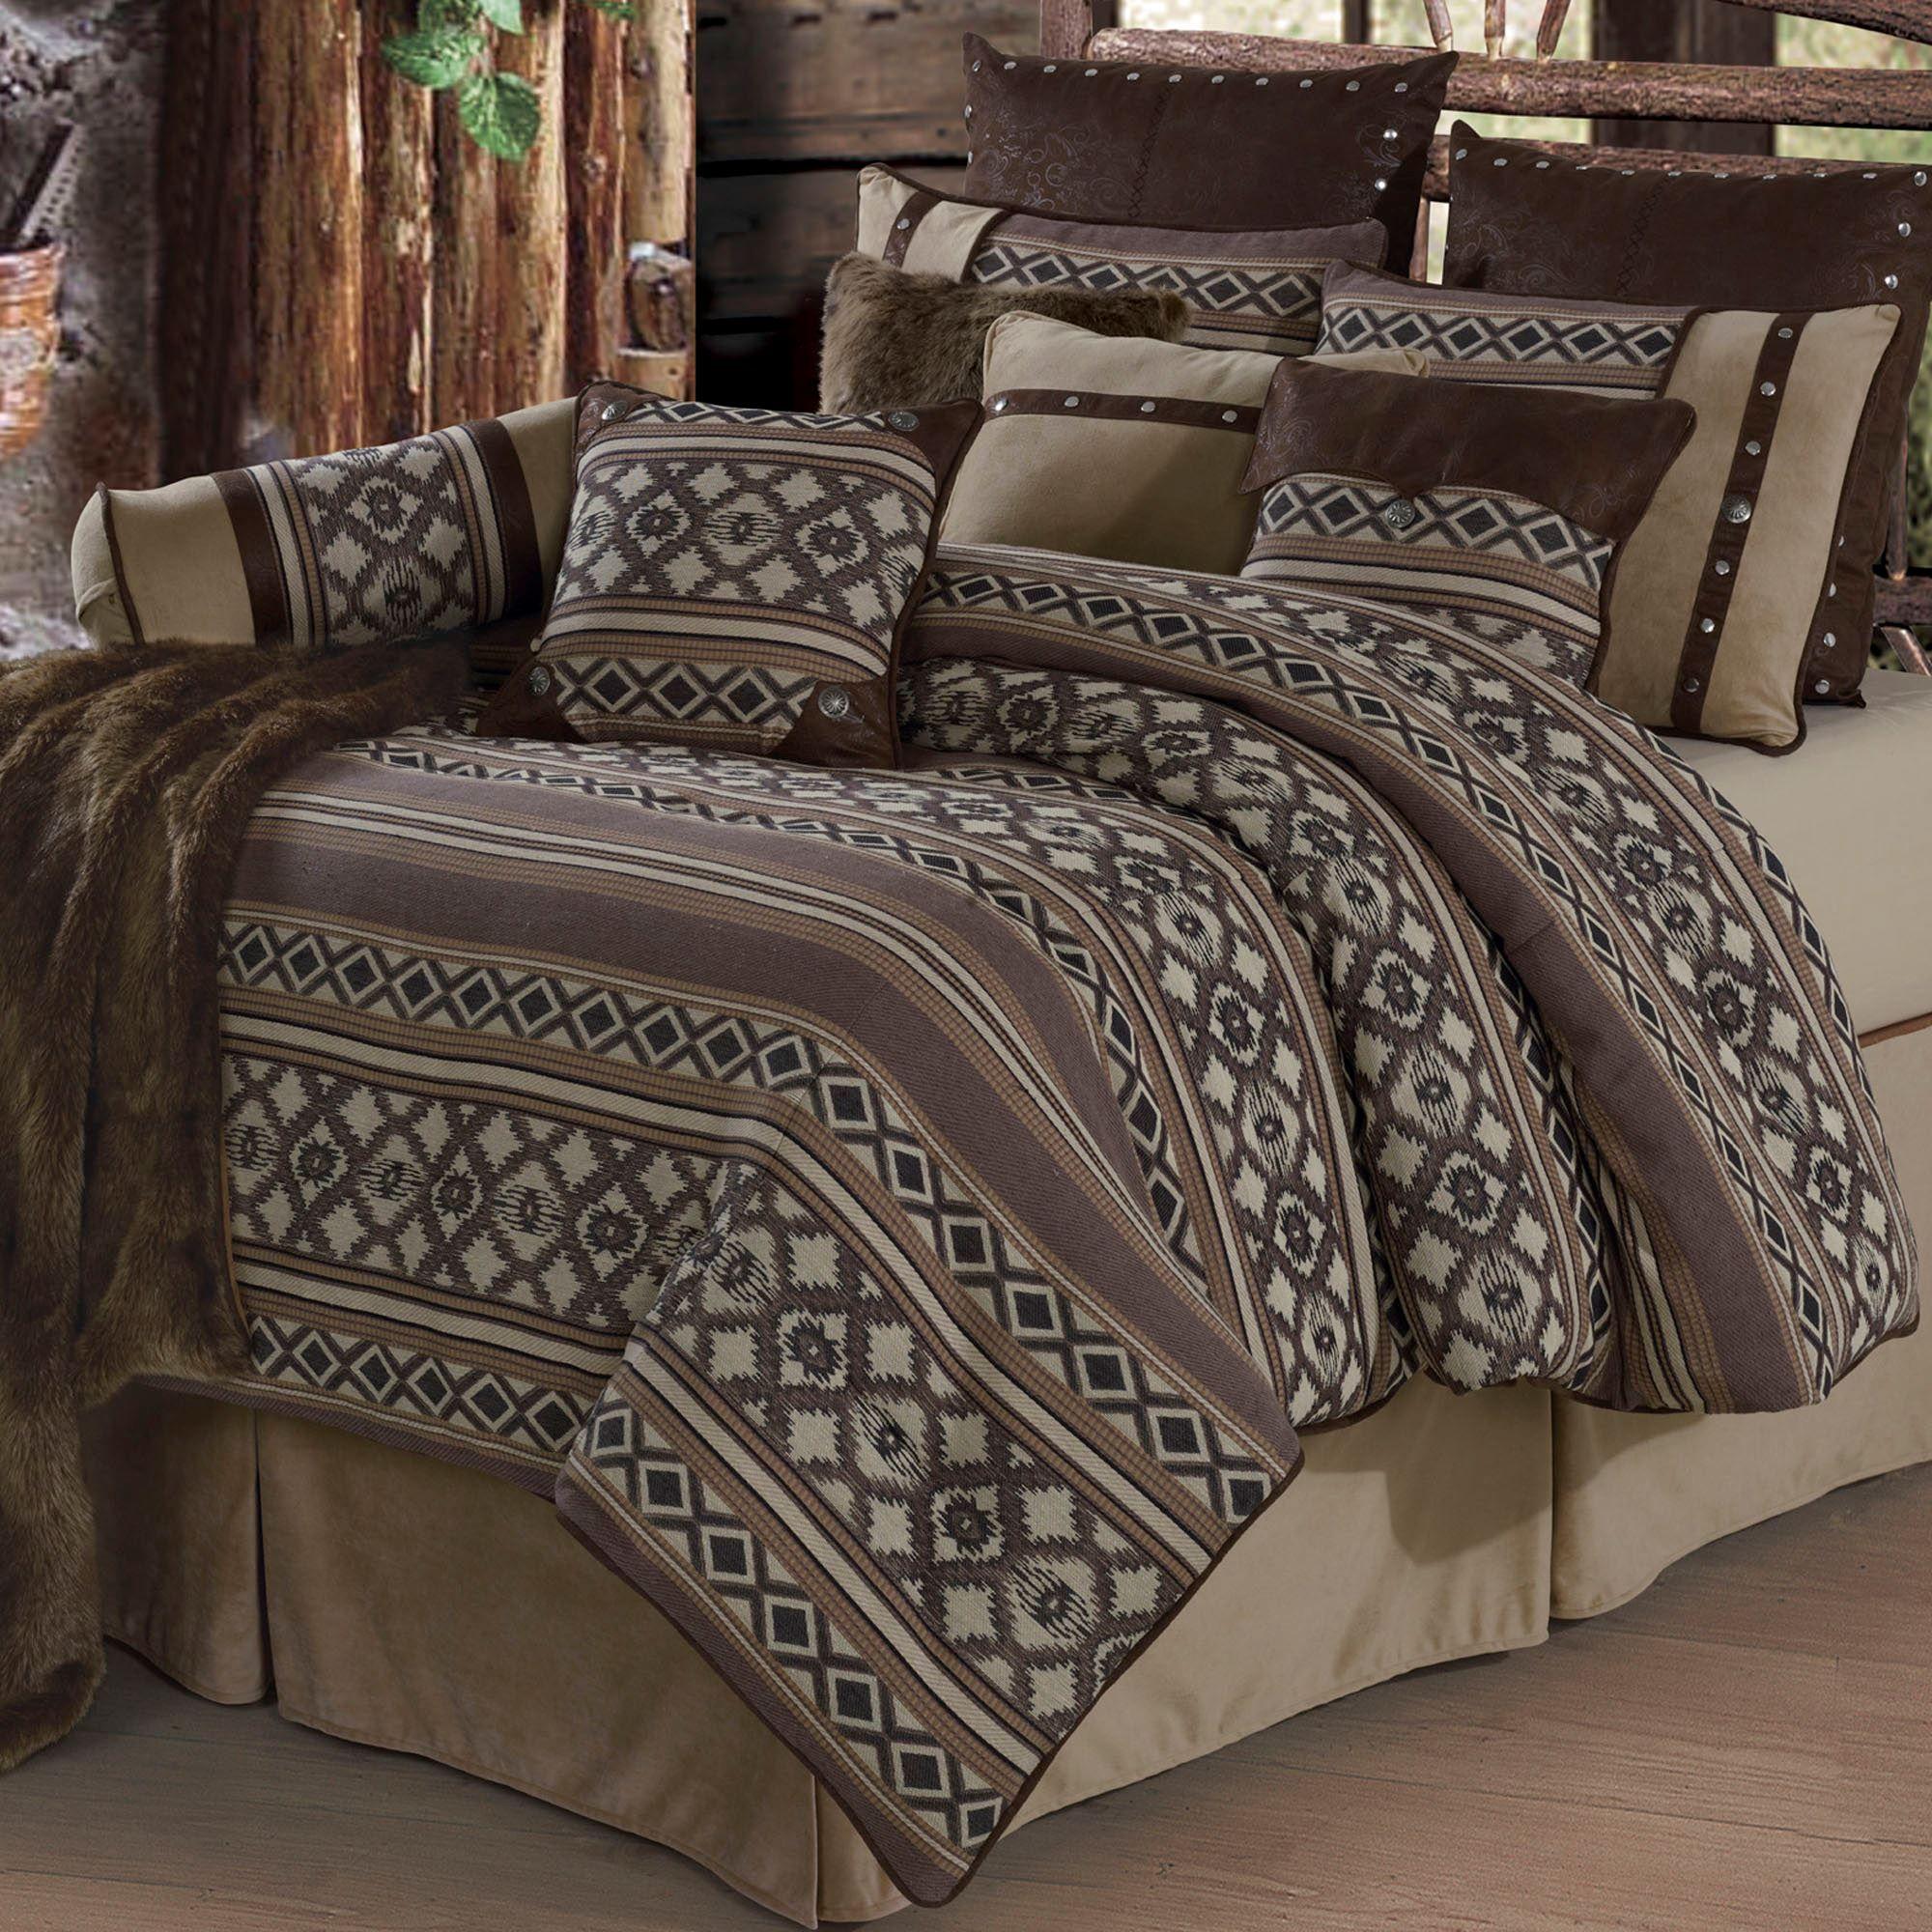 velvet down cover comforter your within house ideas california bedding southwest applied king duvet to comforters covers idea southwestern astounding